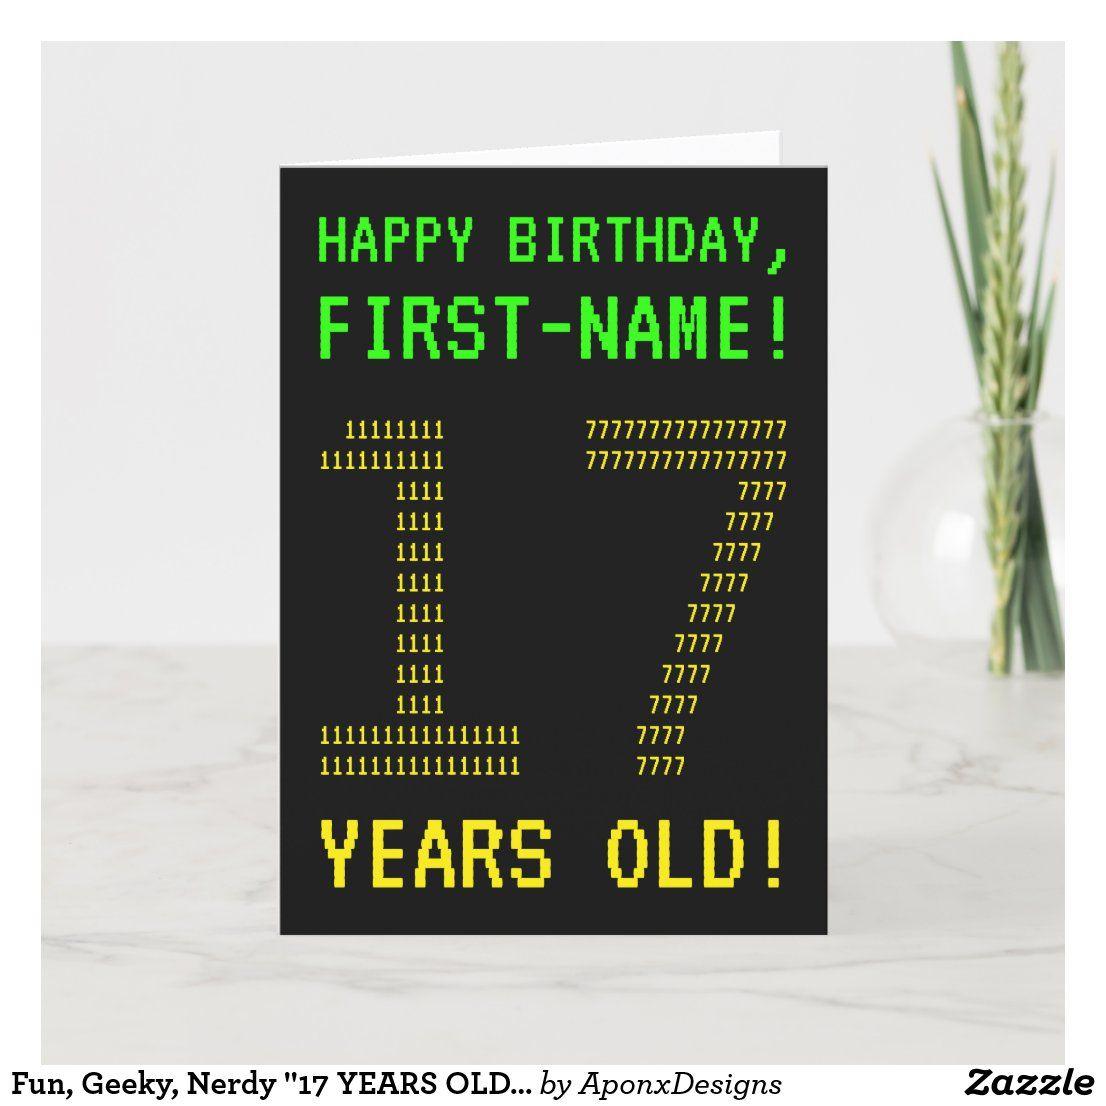 Fun Geeky Nerdy 17 Years Old Birthday Card Zazzle Com Old Birthday Cards Editable Birthday Cards Birthday Greeting Cards